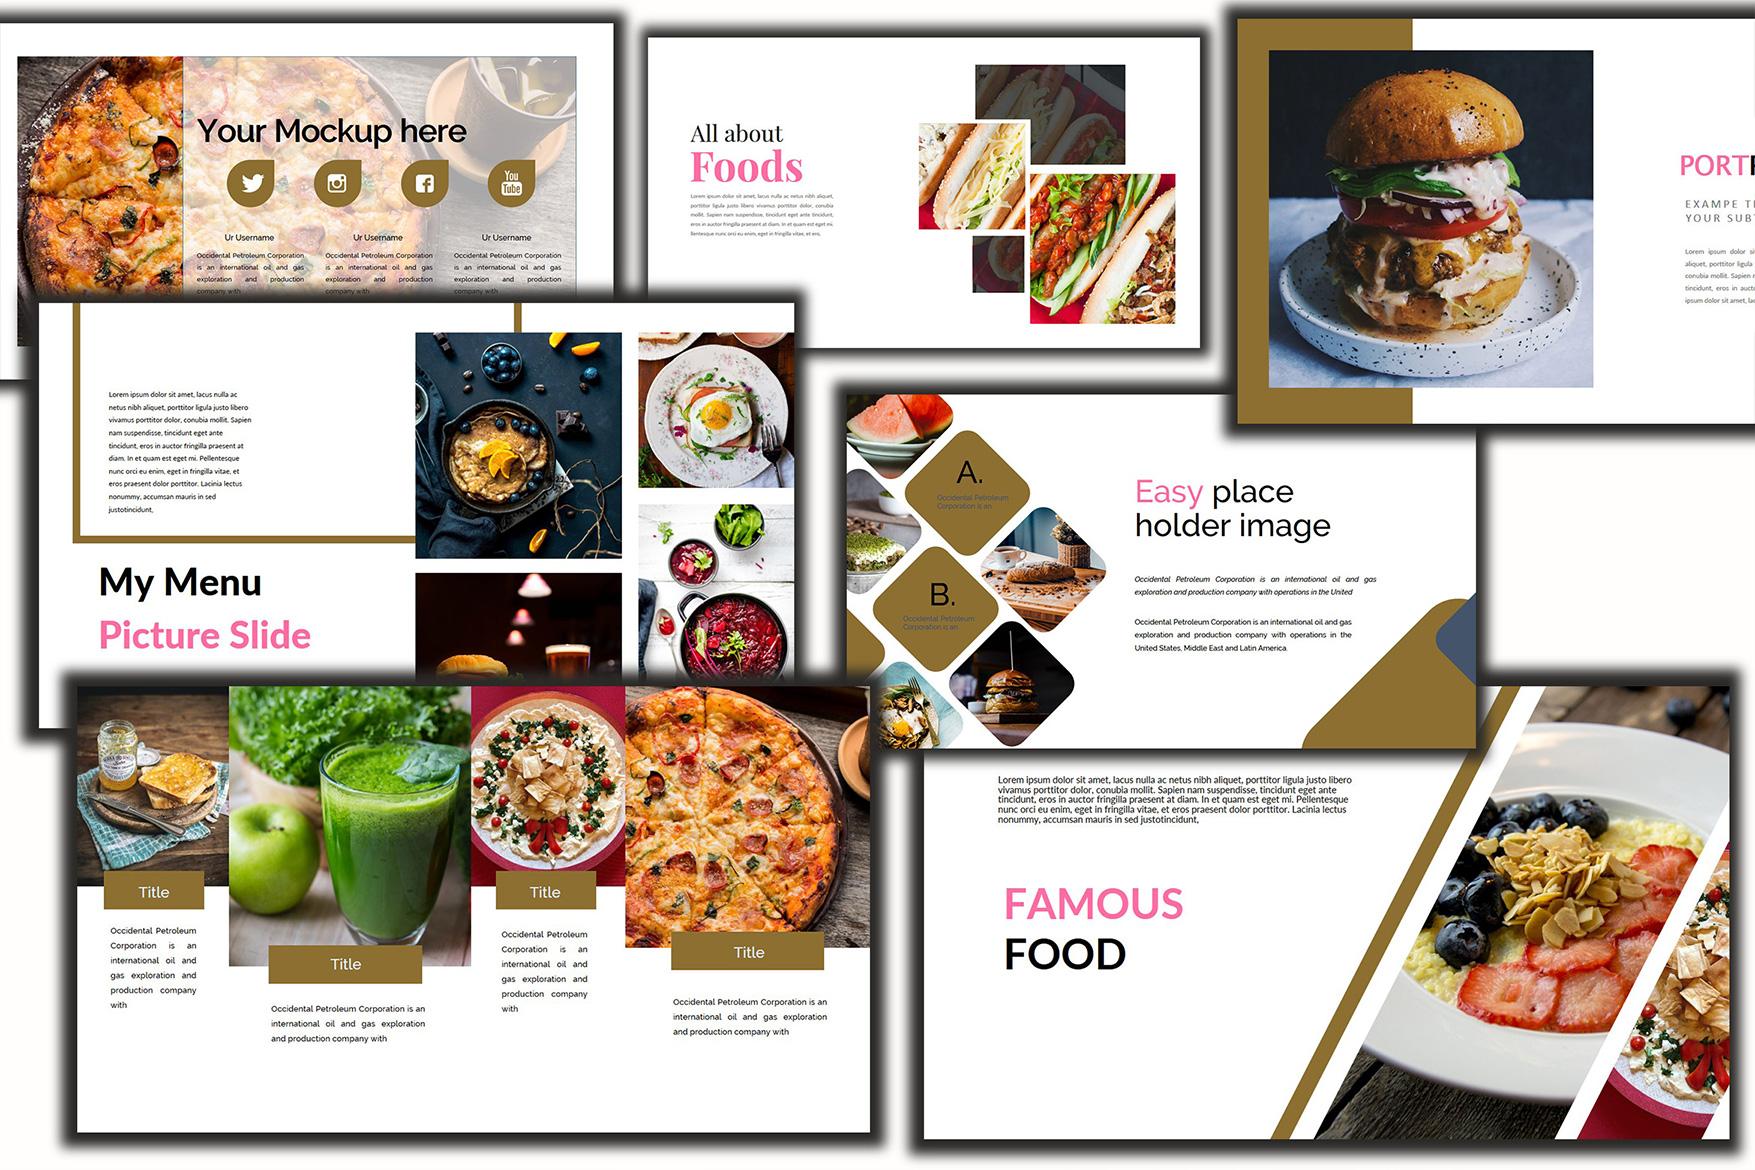 Delicious Food - Google Slides Presentation example image 5